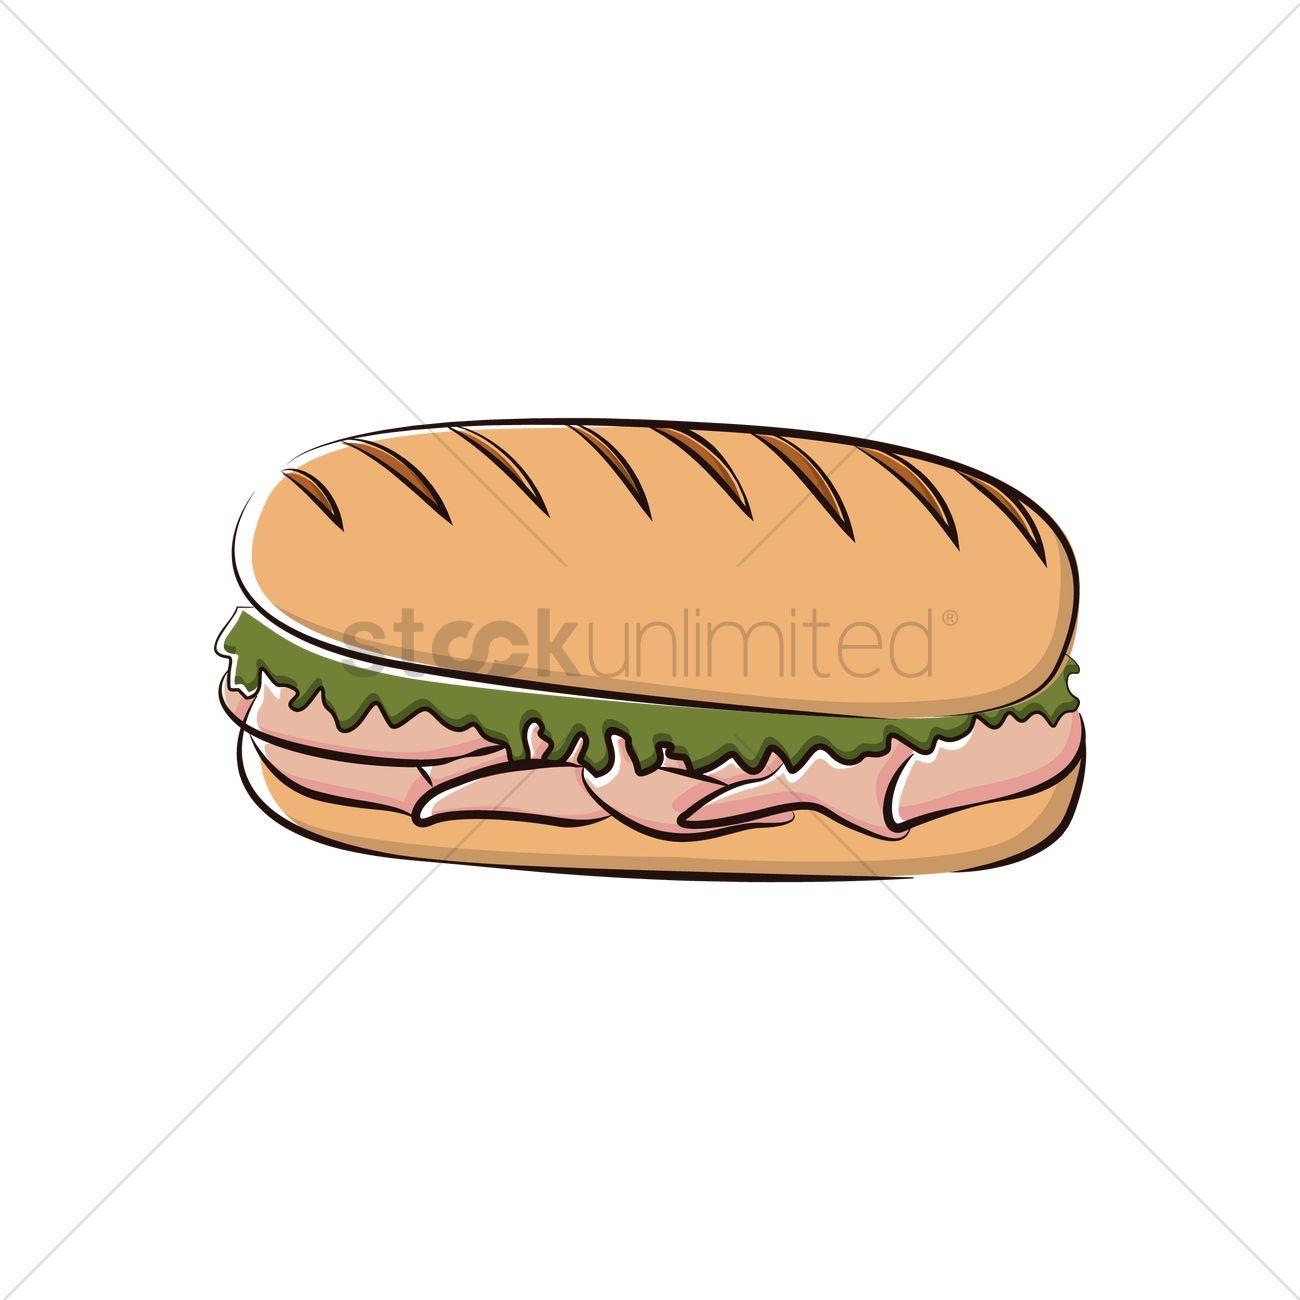 1300x1300 Submarine Sandwich Vector Image